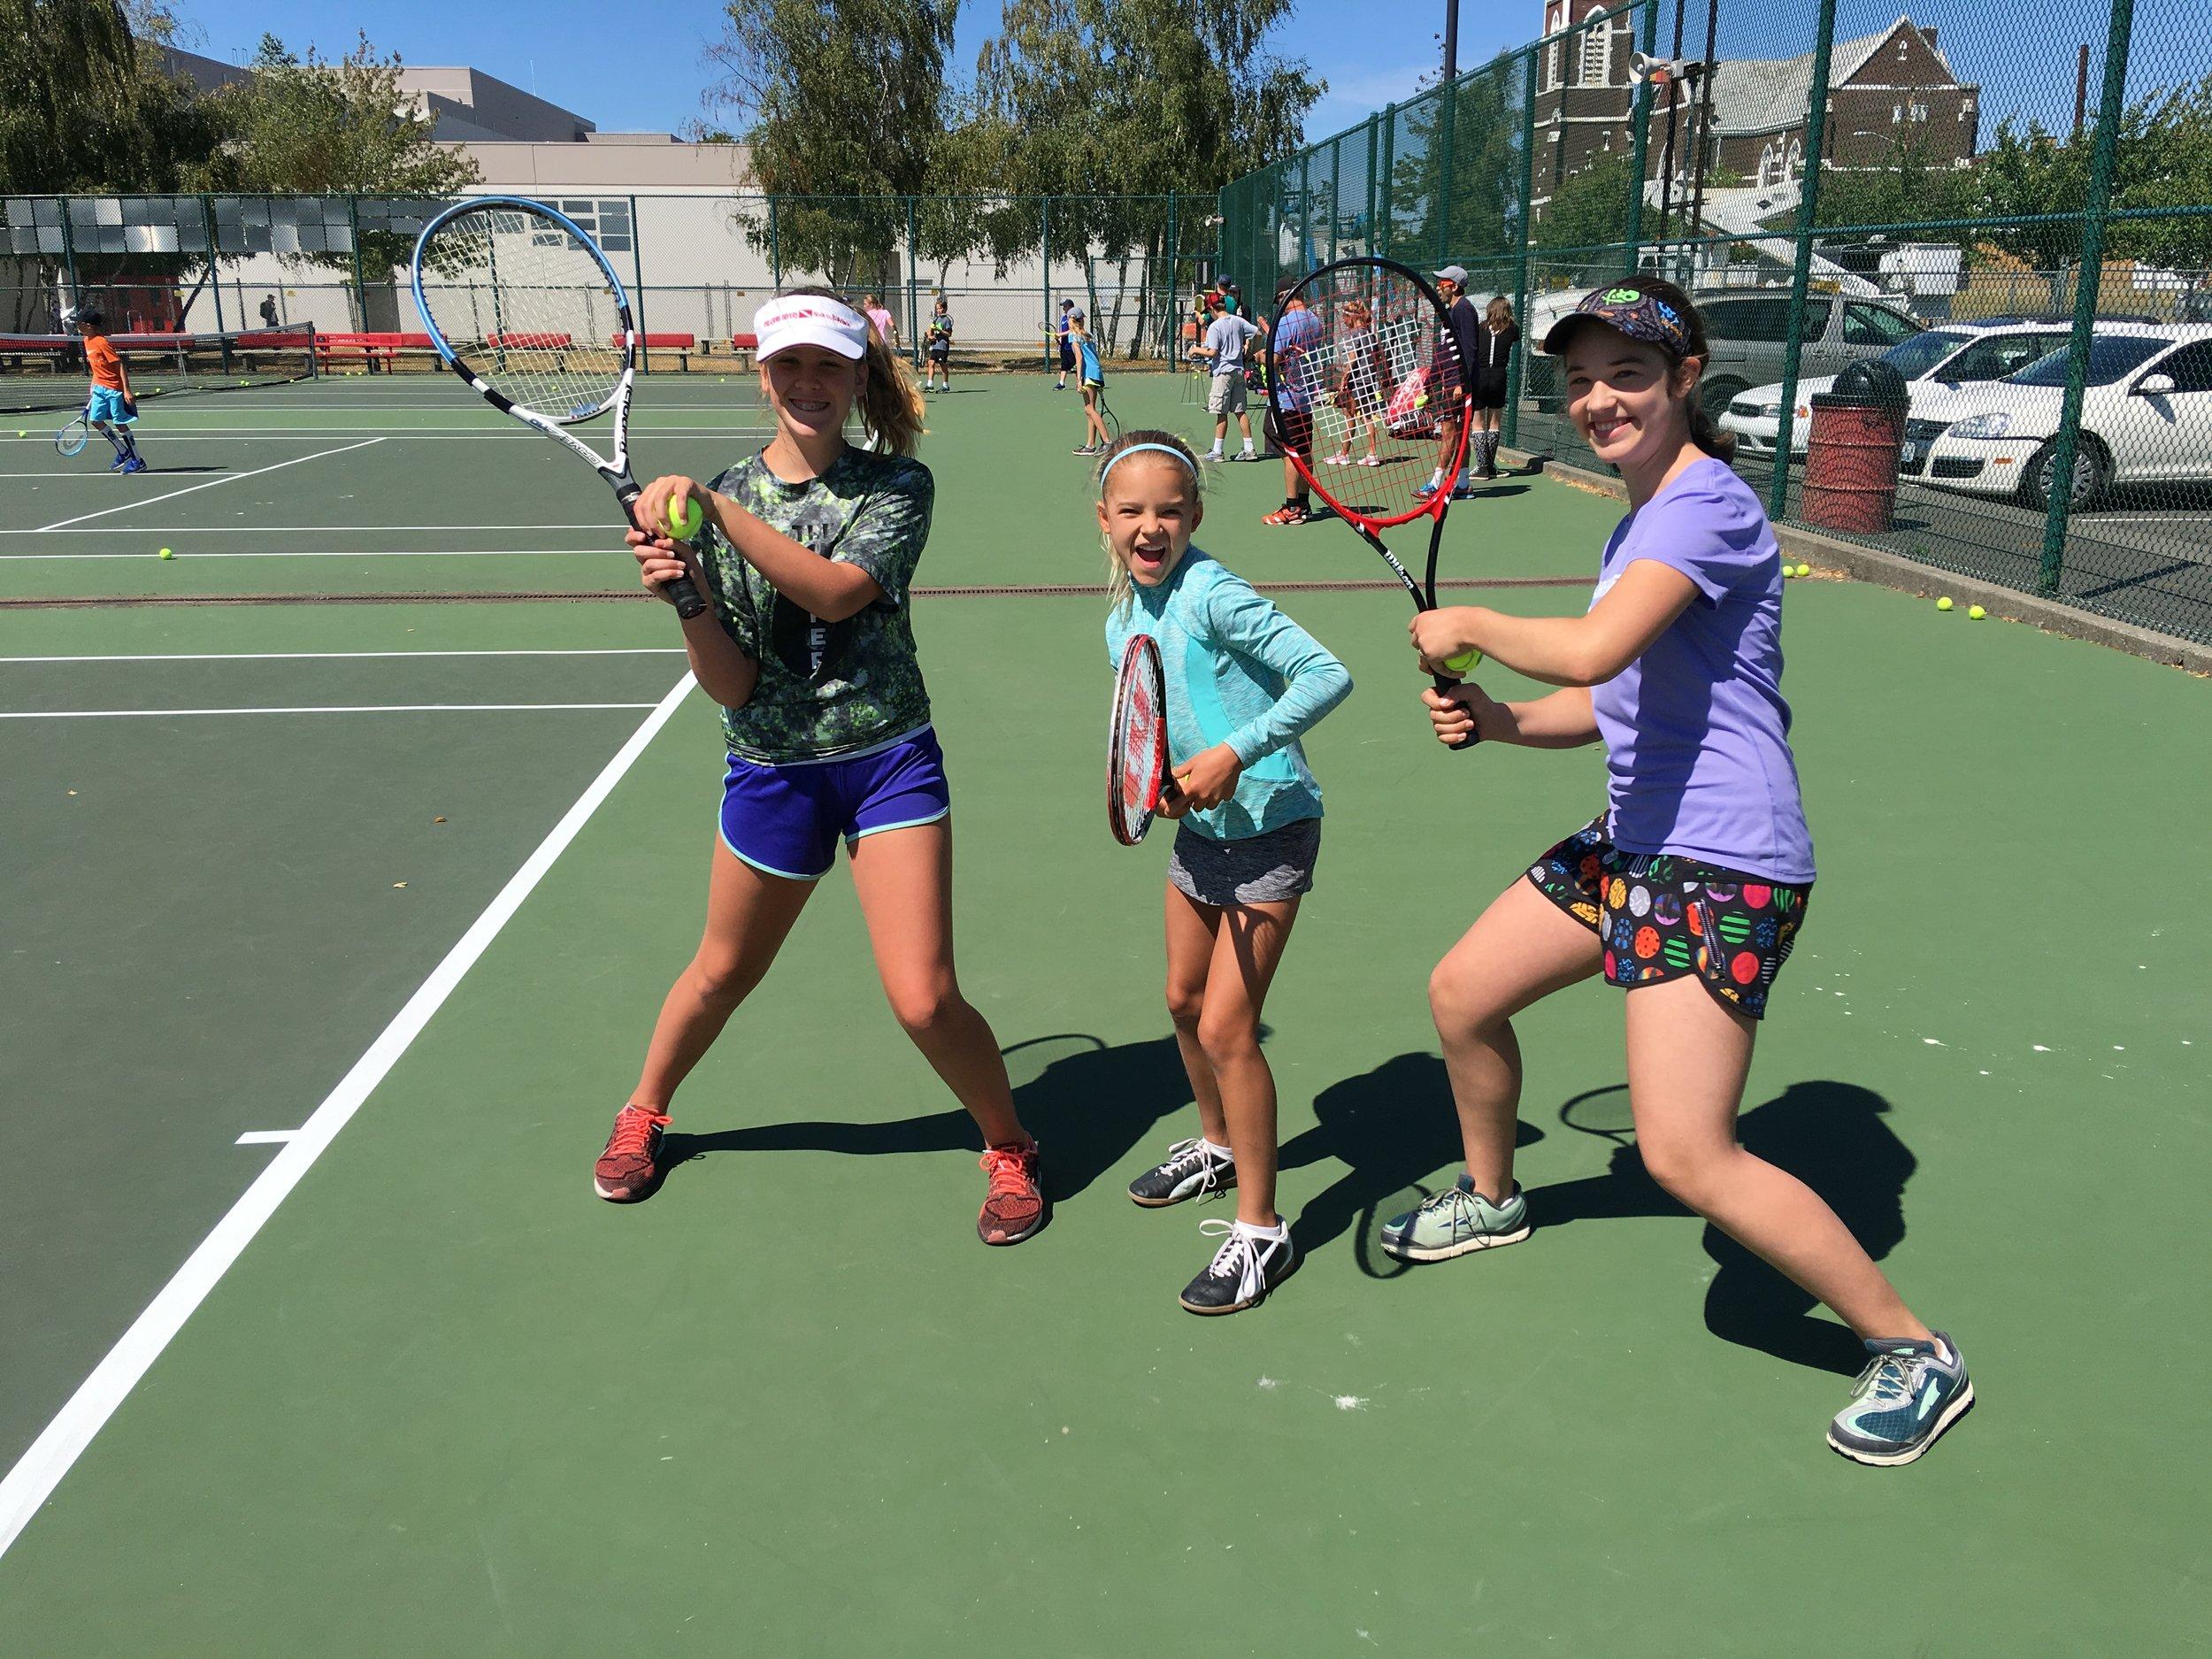 Gain tennis skills while having FUN!